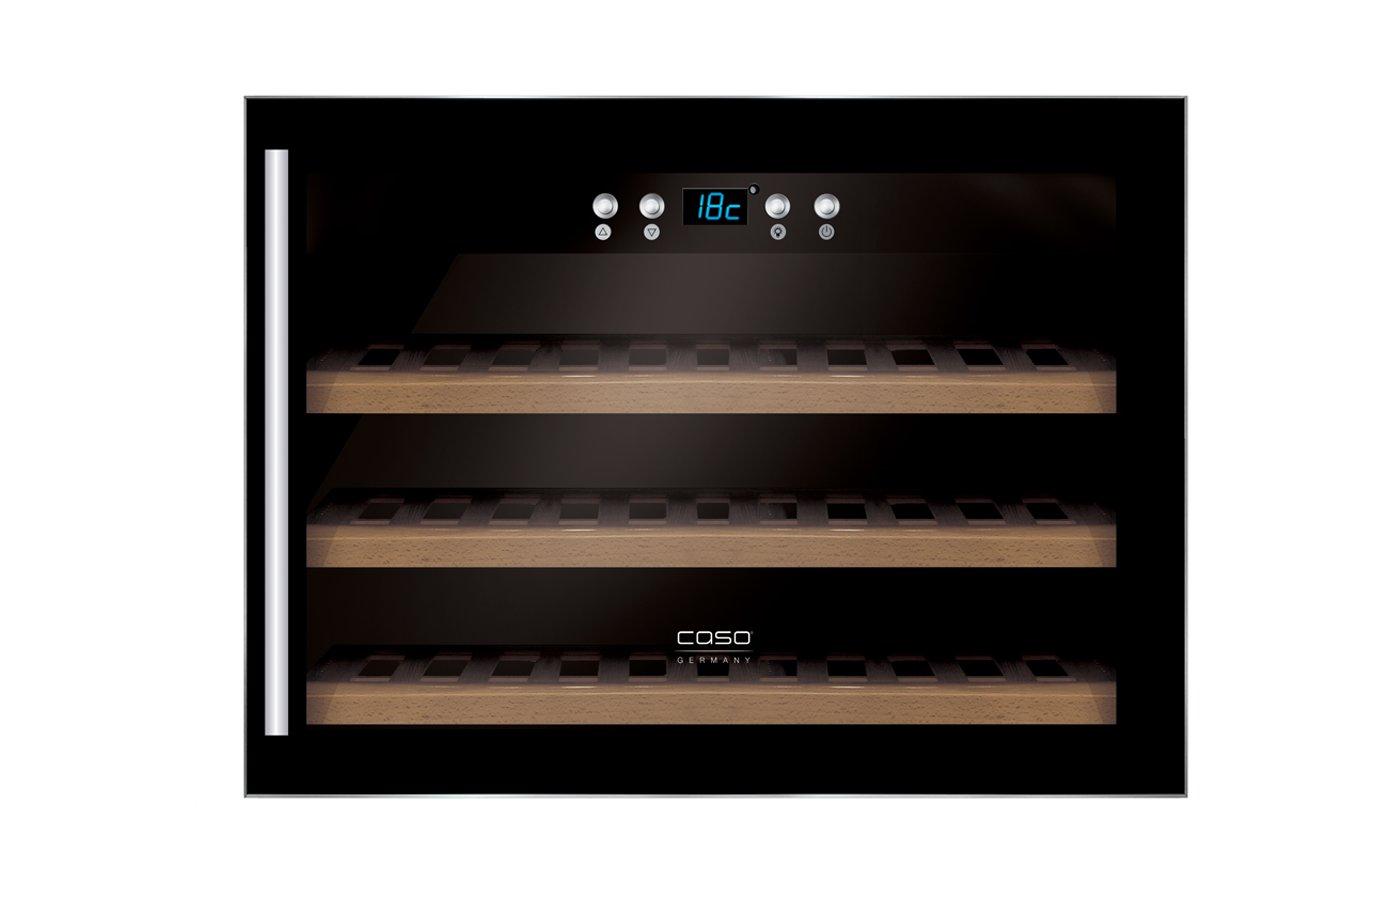 Холодильник CASO WineSafe 18 EB